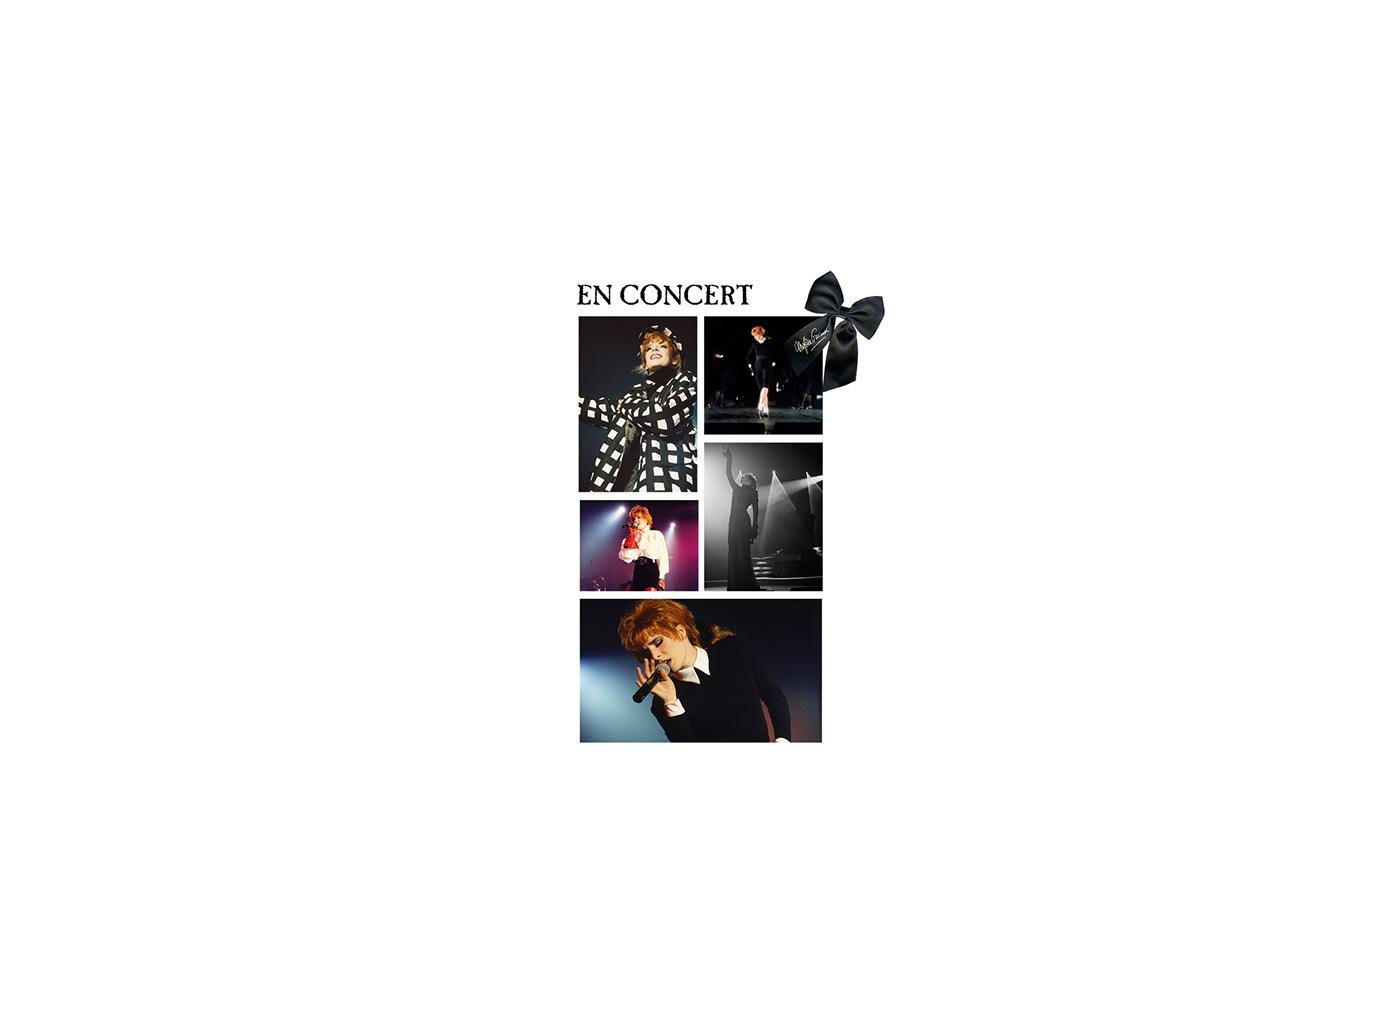 Album Bercy blu-ray concert live live show Mylène Farmer poster steelbook vinyl